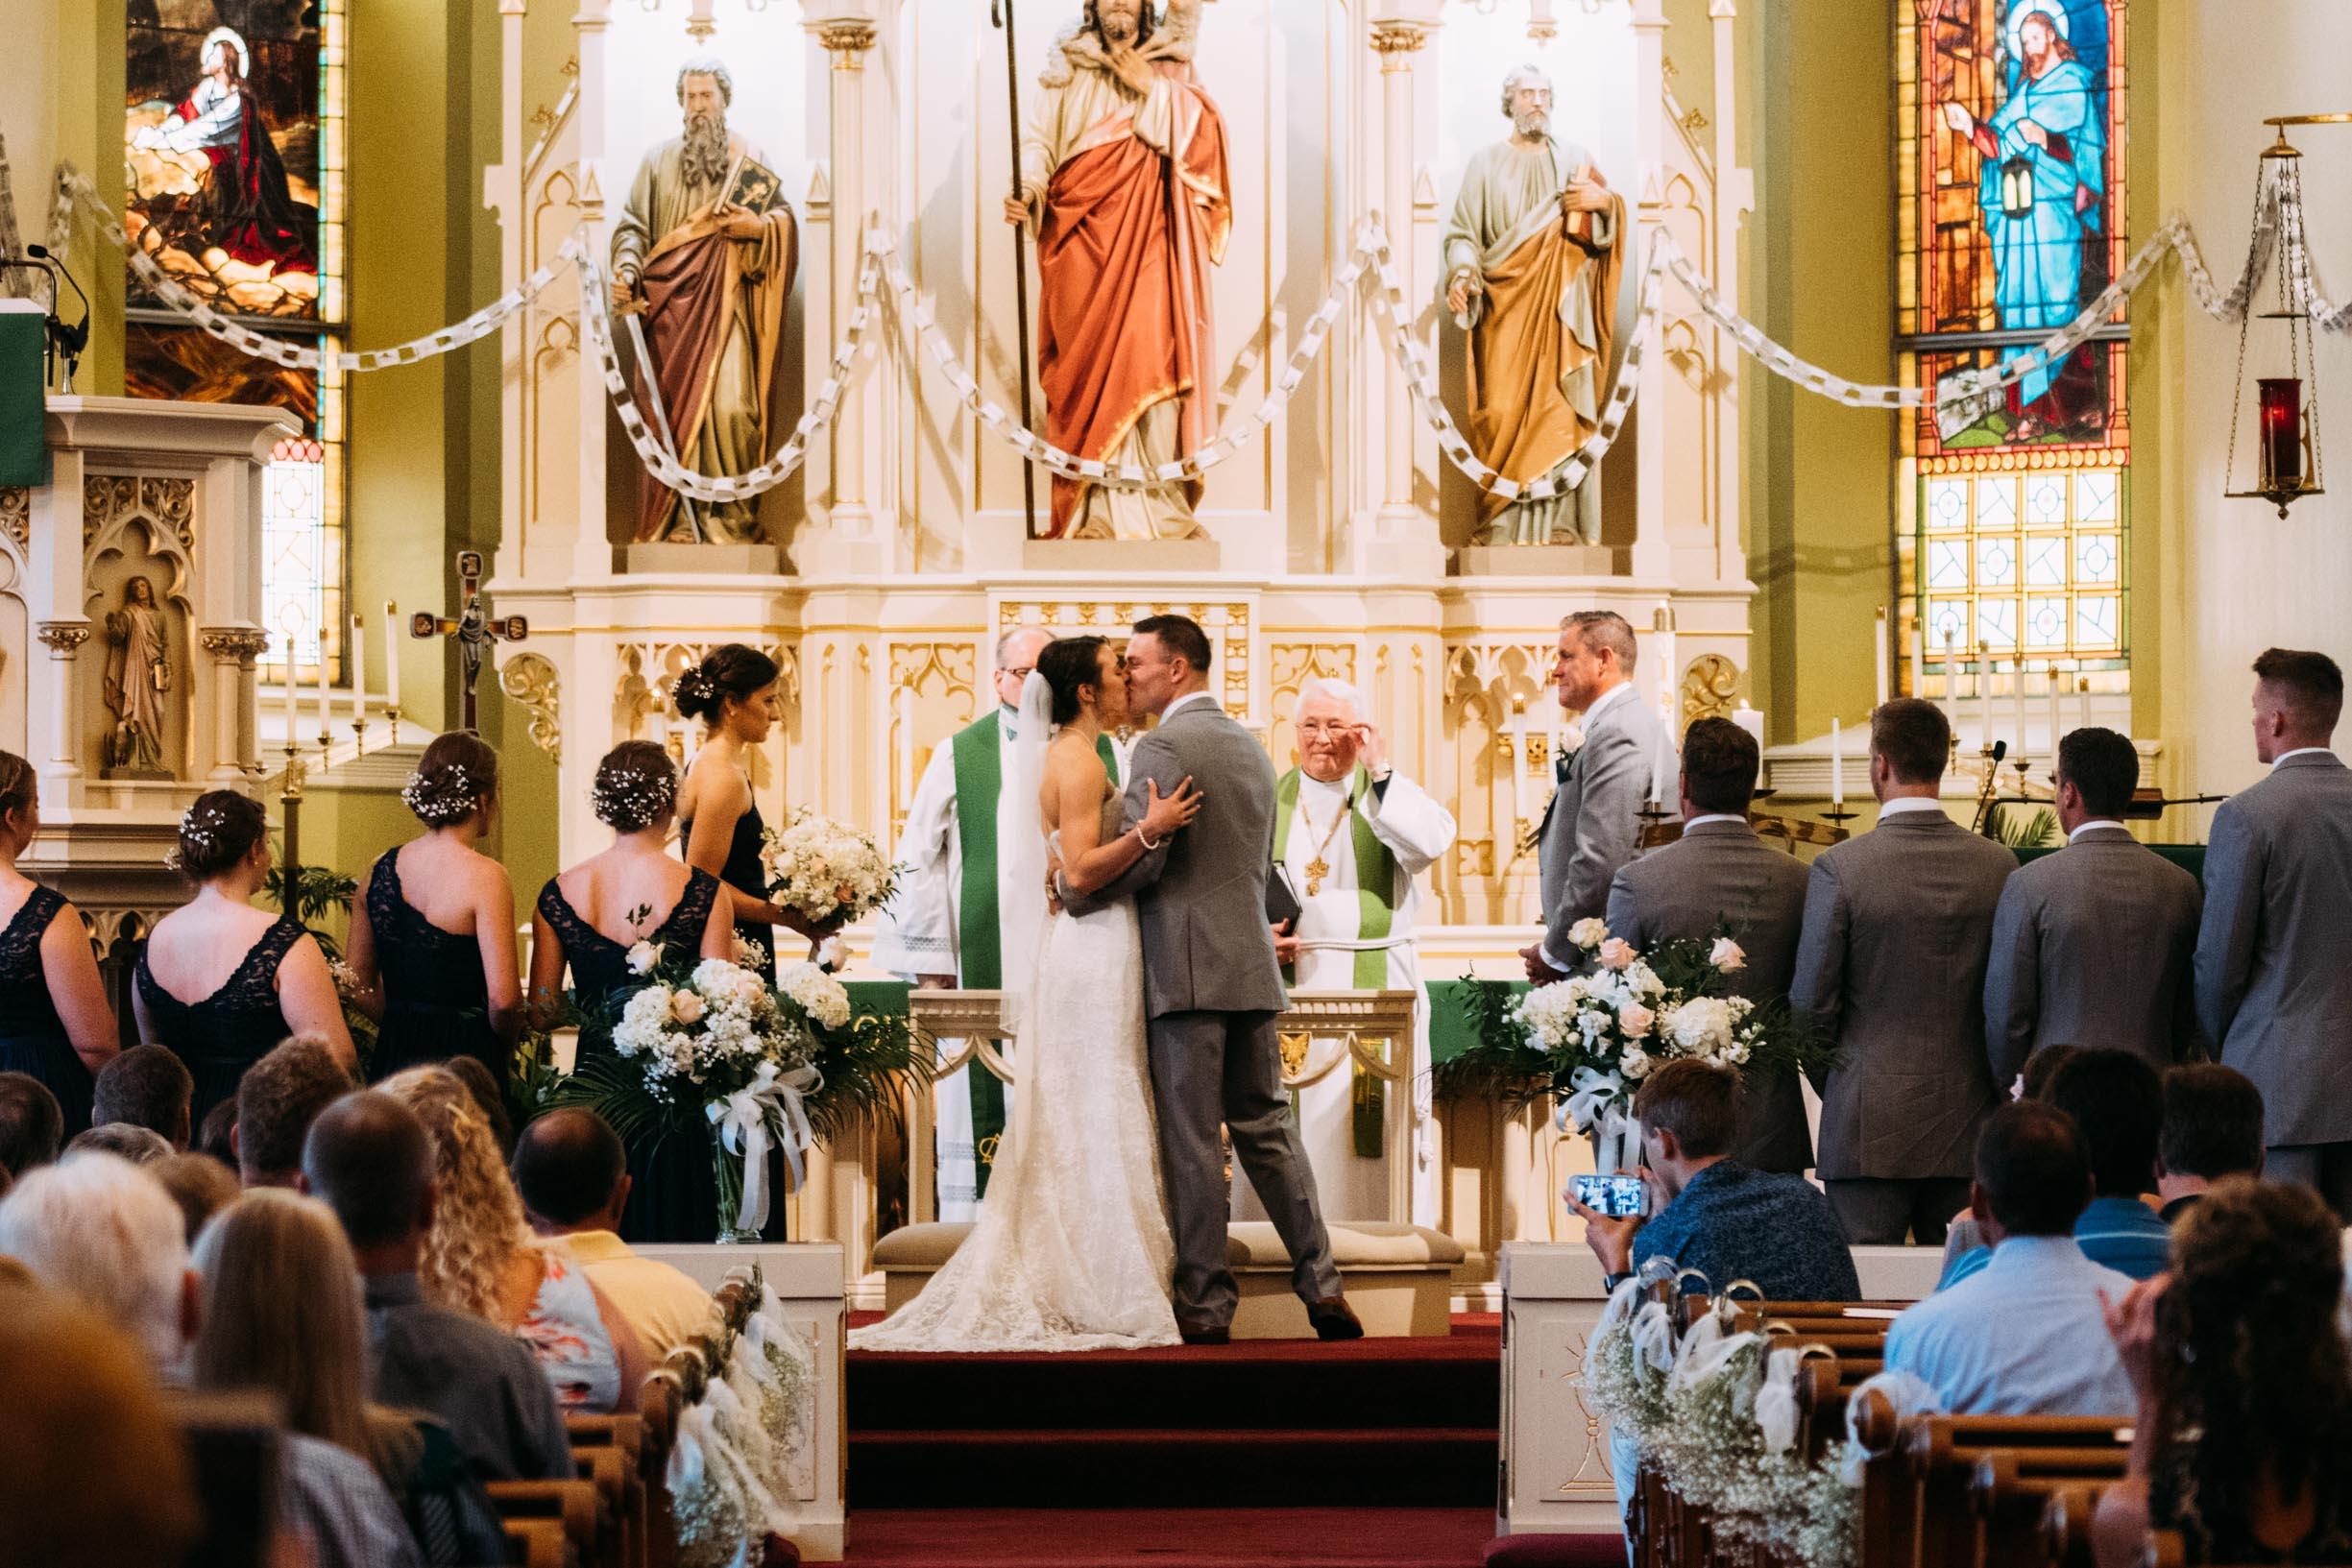 15-Lindsey Jake Wedding Winona St Martin's Lutheran Church.jpg